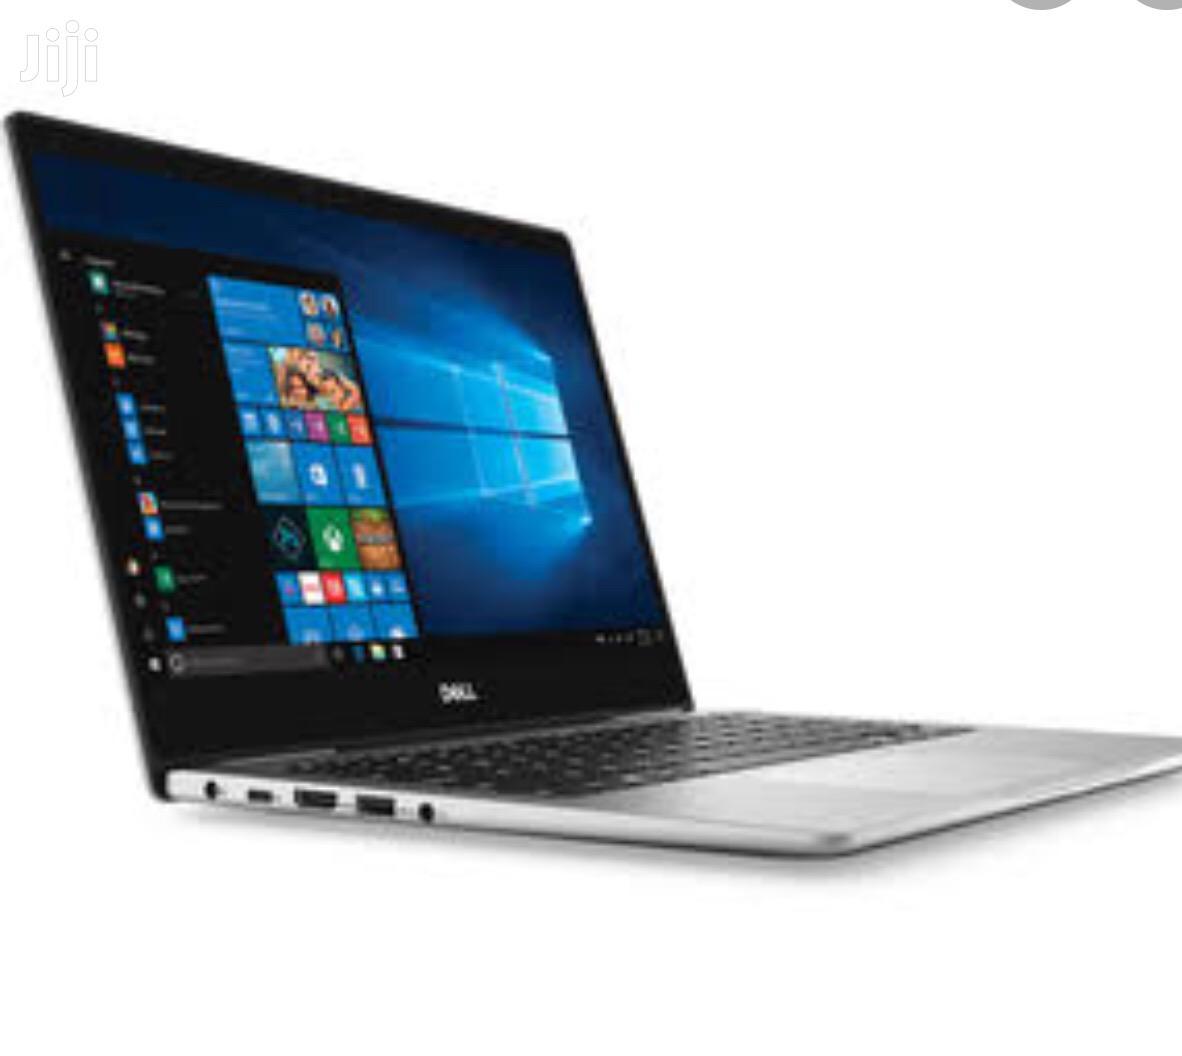 Laptop Dell Studio XPS 13 (1340) 8GB Intel Core I5 SSD 256GB | Laptops & Computers for sale in Nairobi Central, Nairobi, Kenya